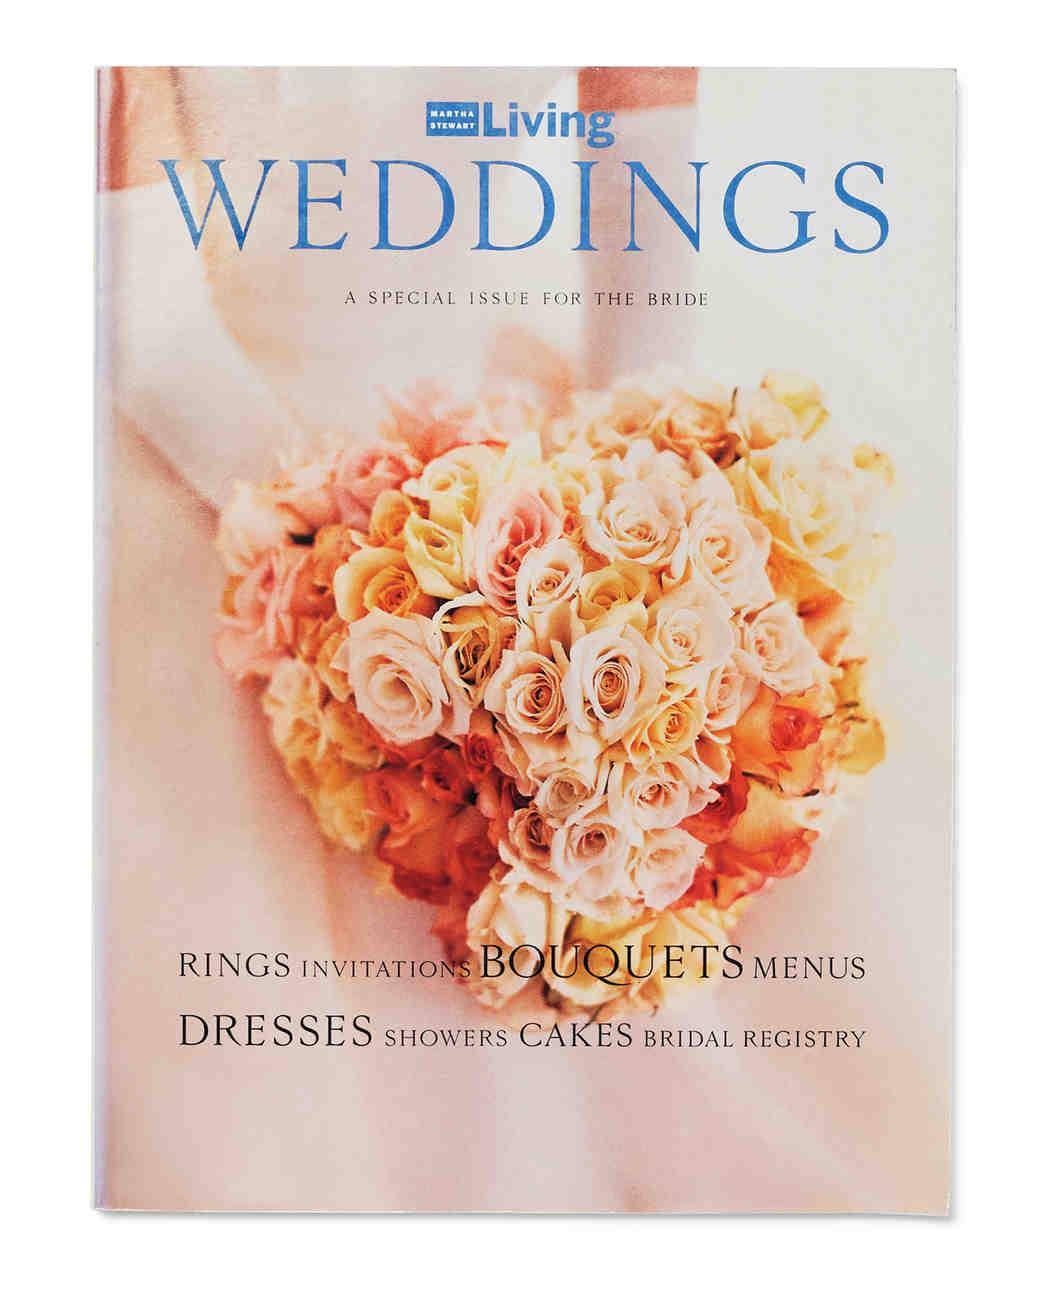 old-weddings-magazine-stack-091-d111549.jpg